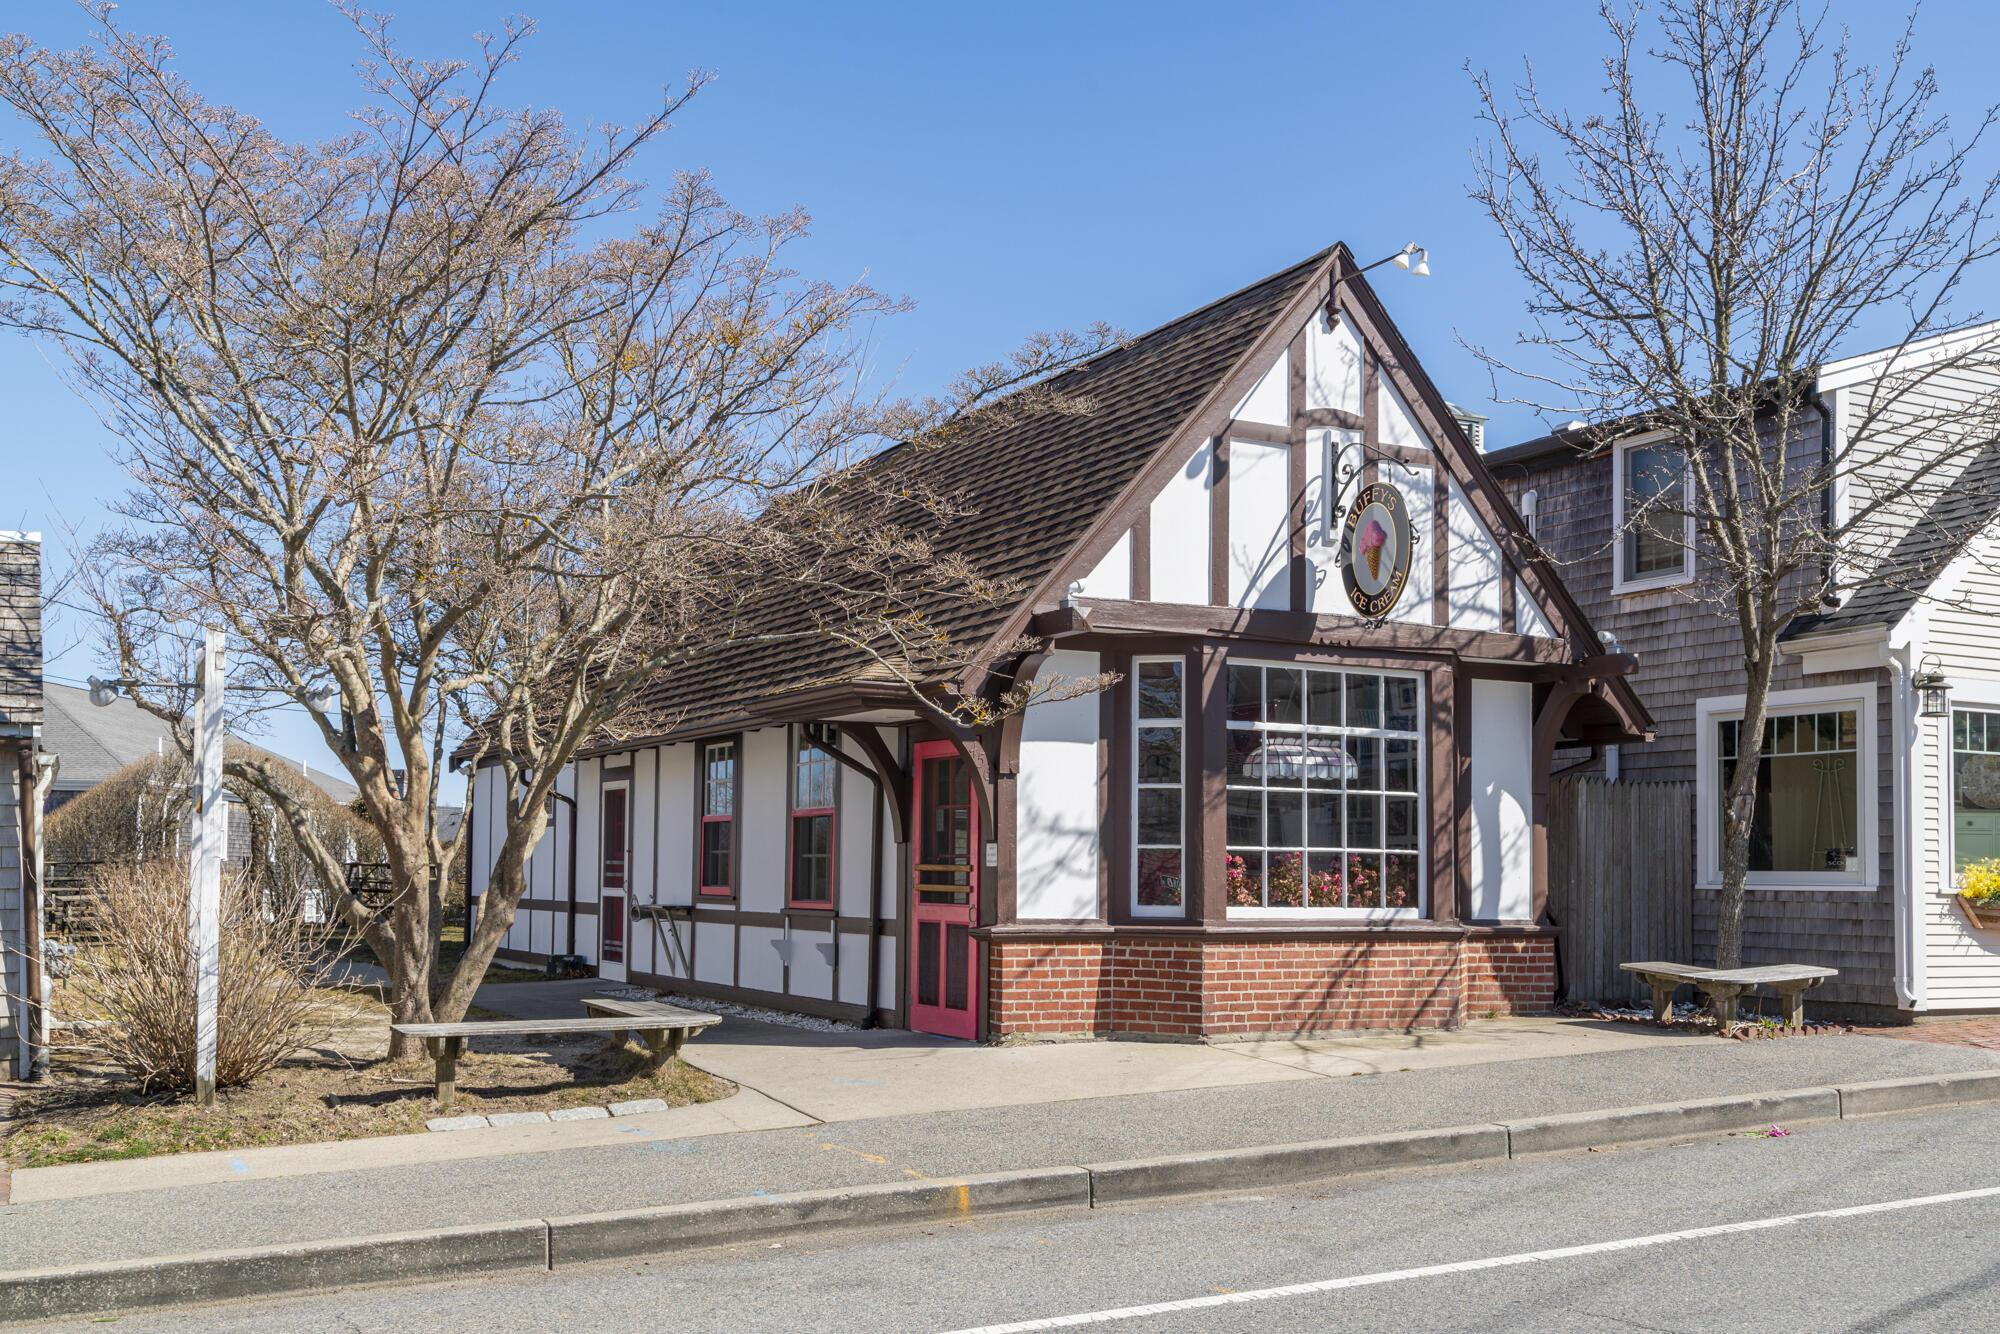 456 Main Street, Chatham, MA  02633 - slide 8